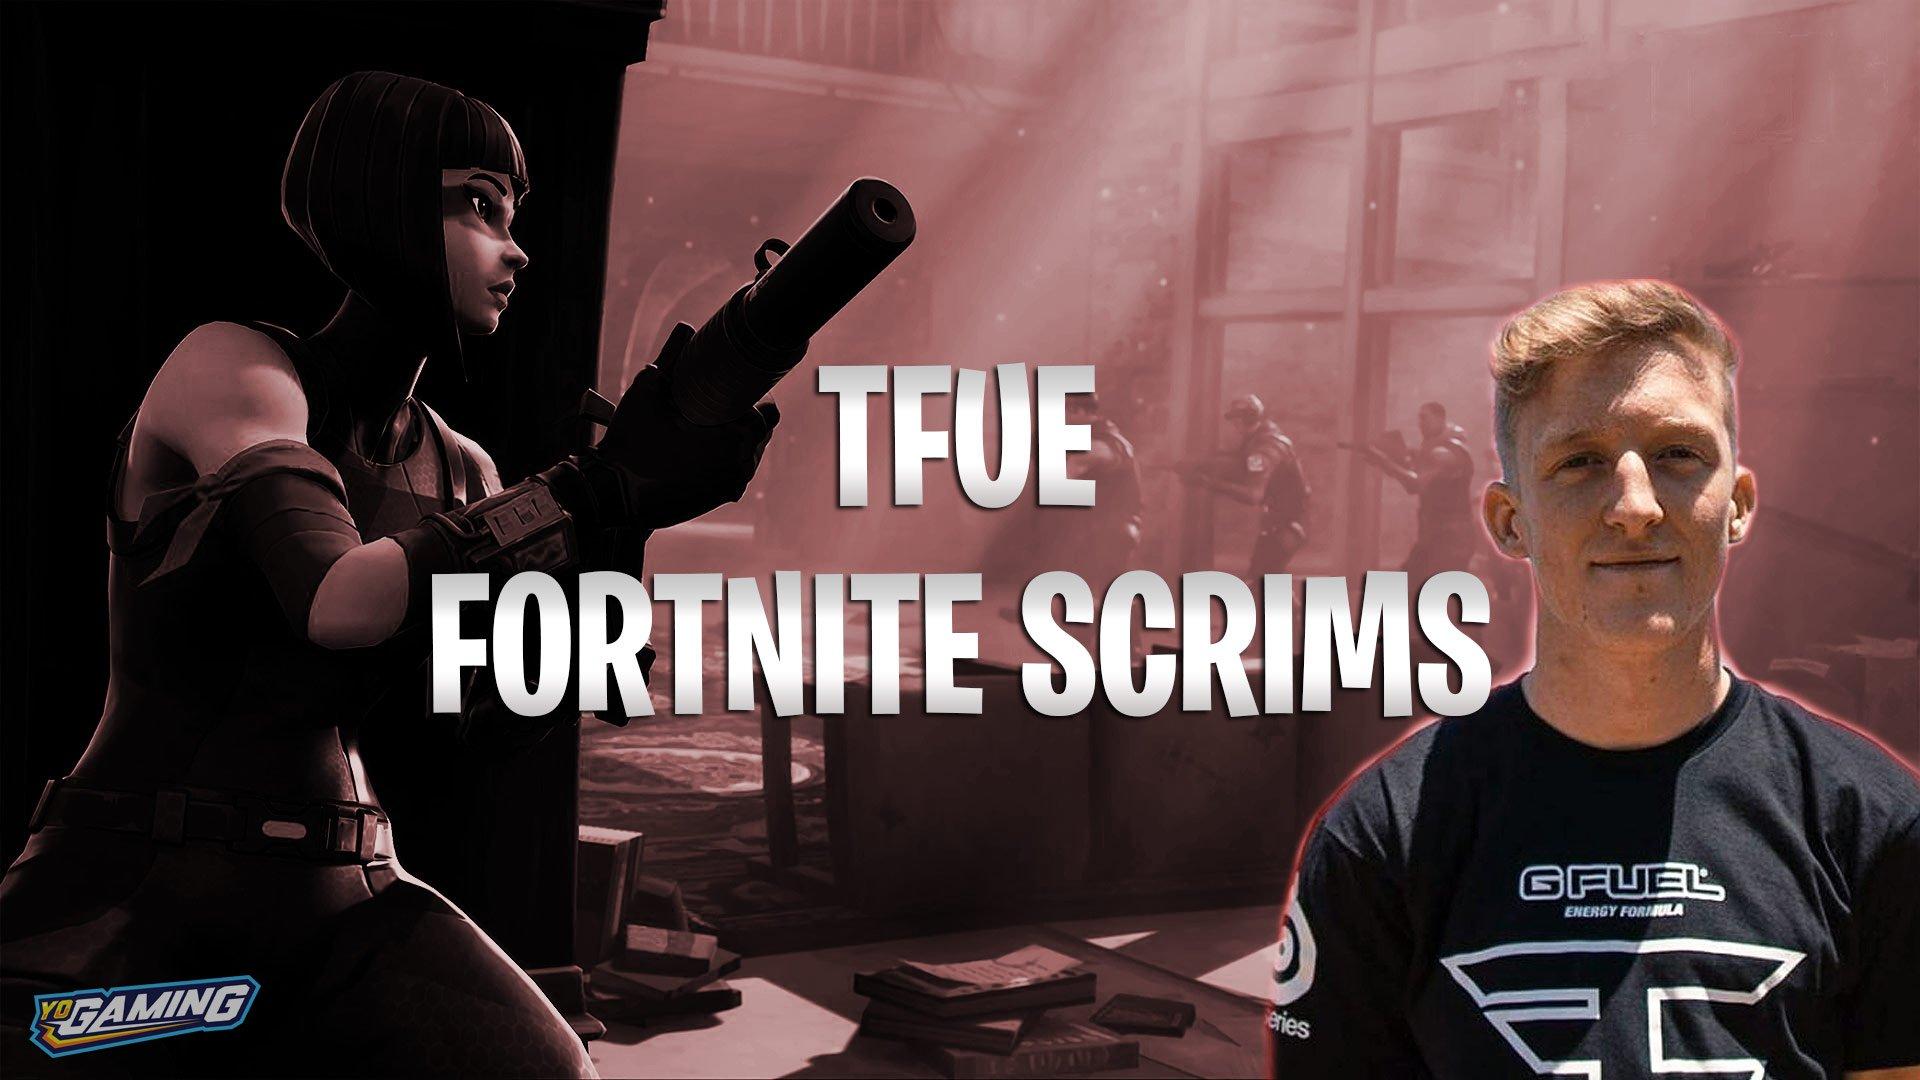 tfue fortnite scrim discord - how to join fortnite scrims discord